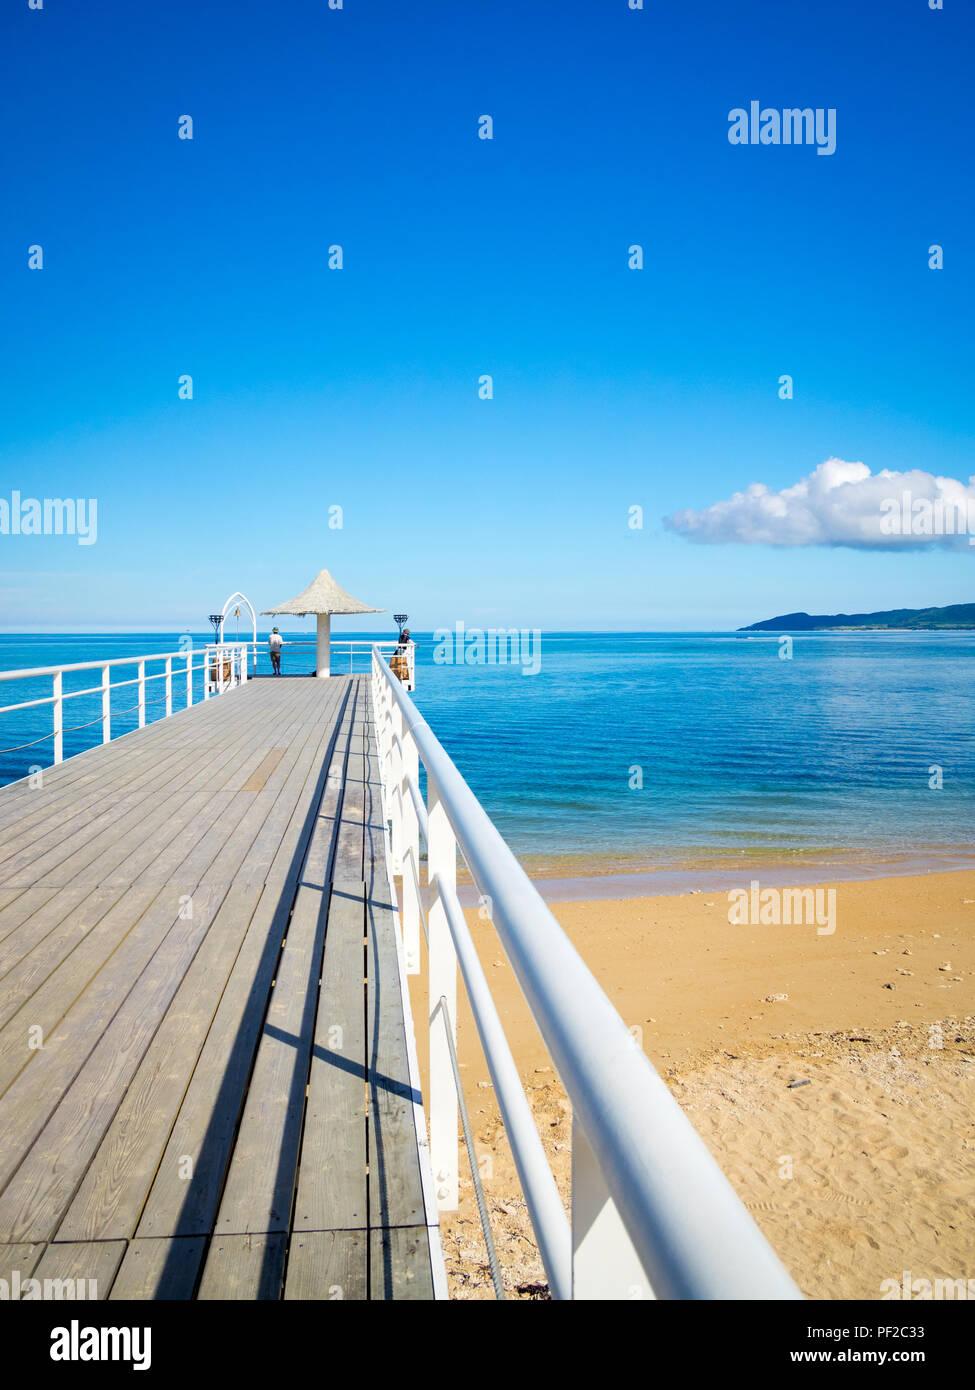 A view of Fusaki Angel Pier and Fusaki Beach on the southwest coast of Ishigaki Island (Ishigaki-jima), Okinawa Prefecture, Yaeyama Islands, Japan. - Stock Image